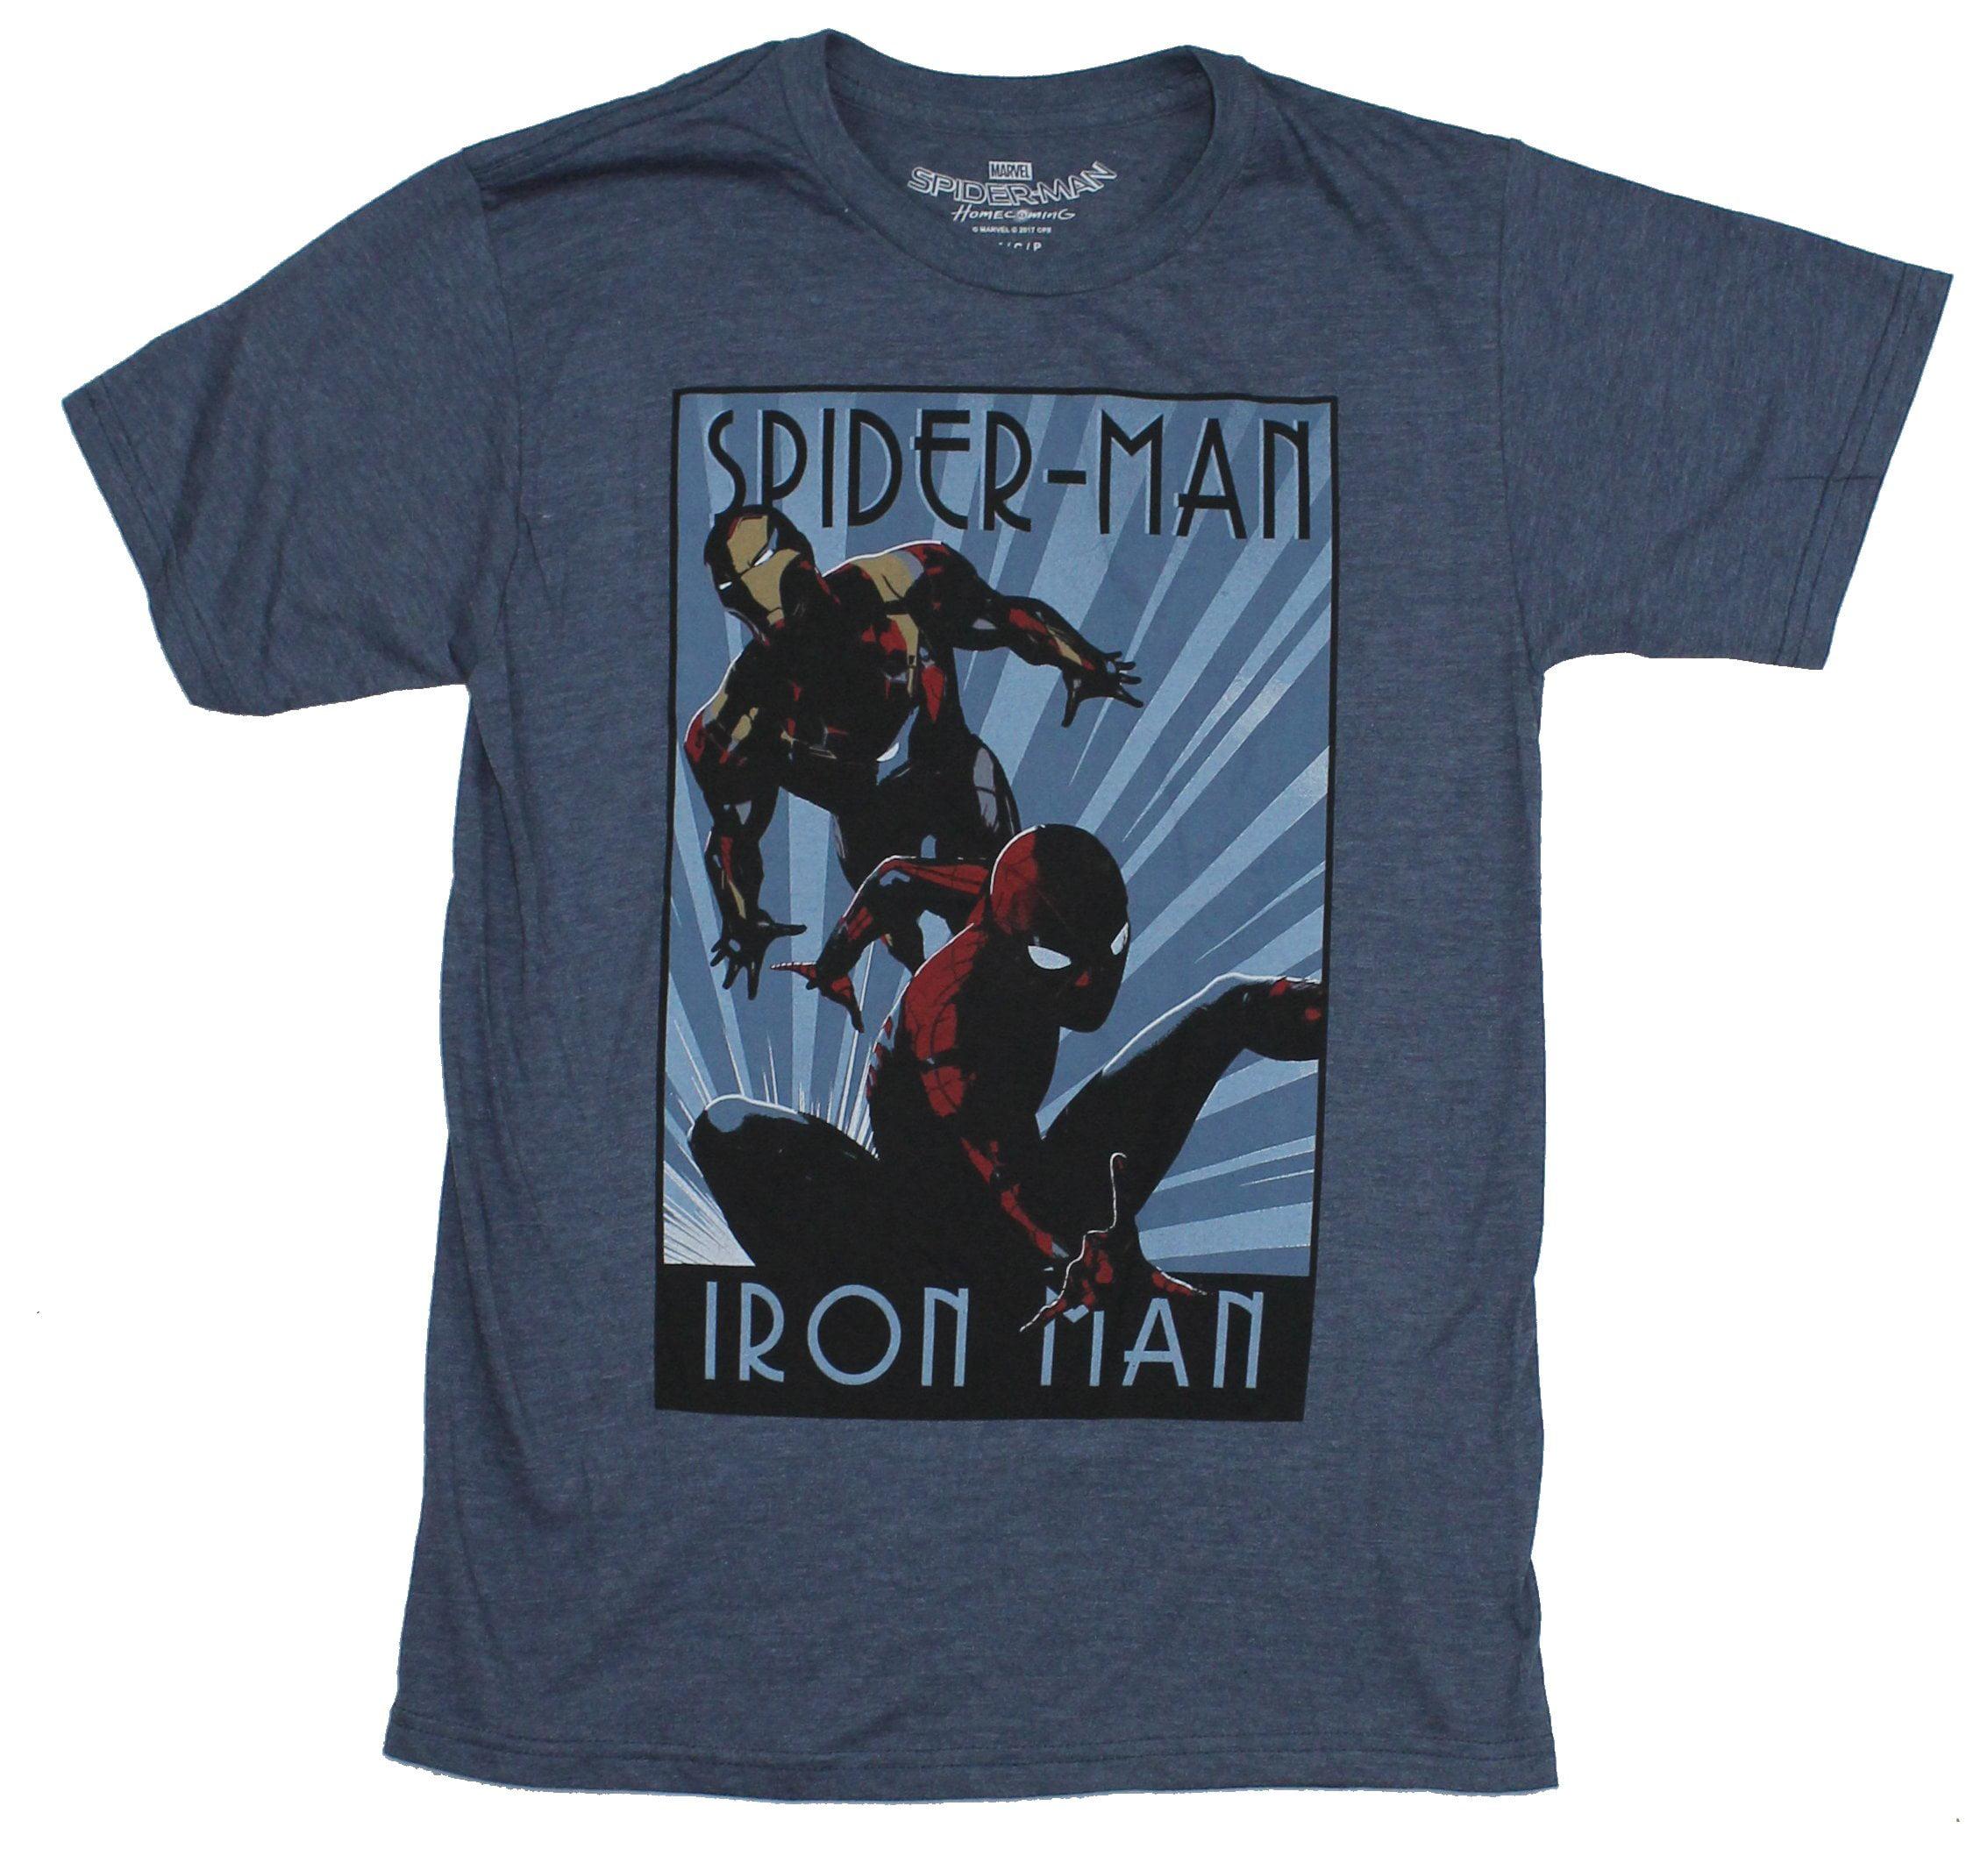 Spider-Man Iron Man Marvel Mens T-Shirt - Art Deco Poster Style Image